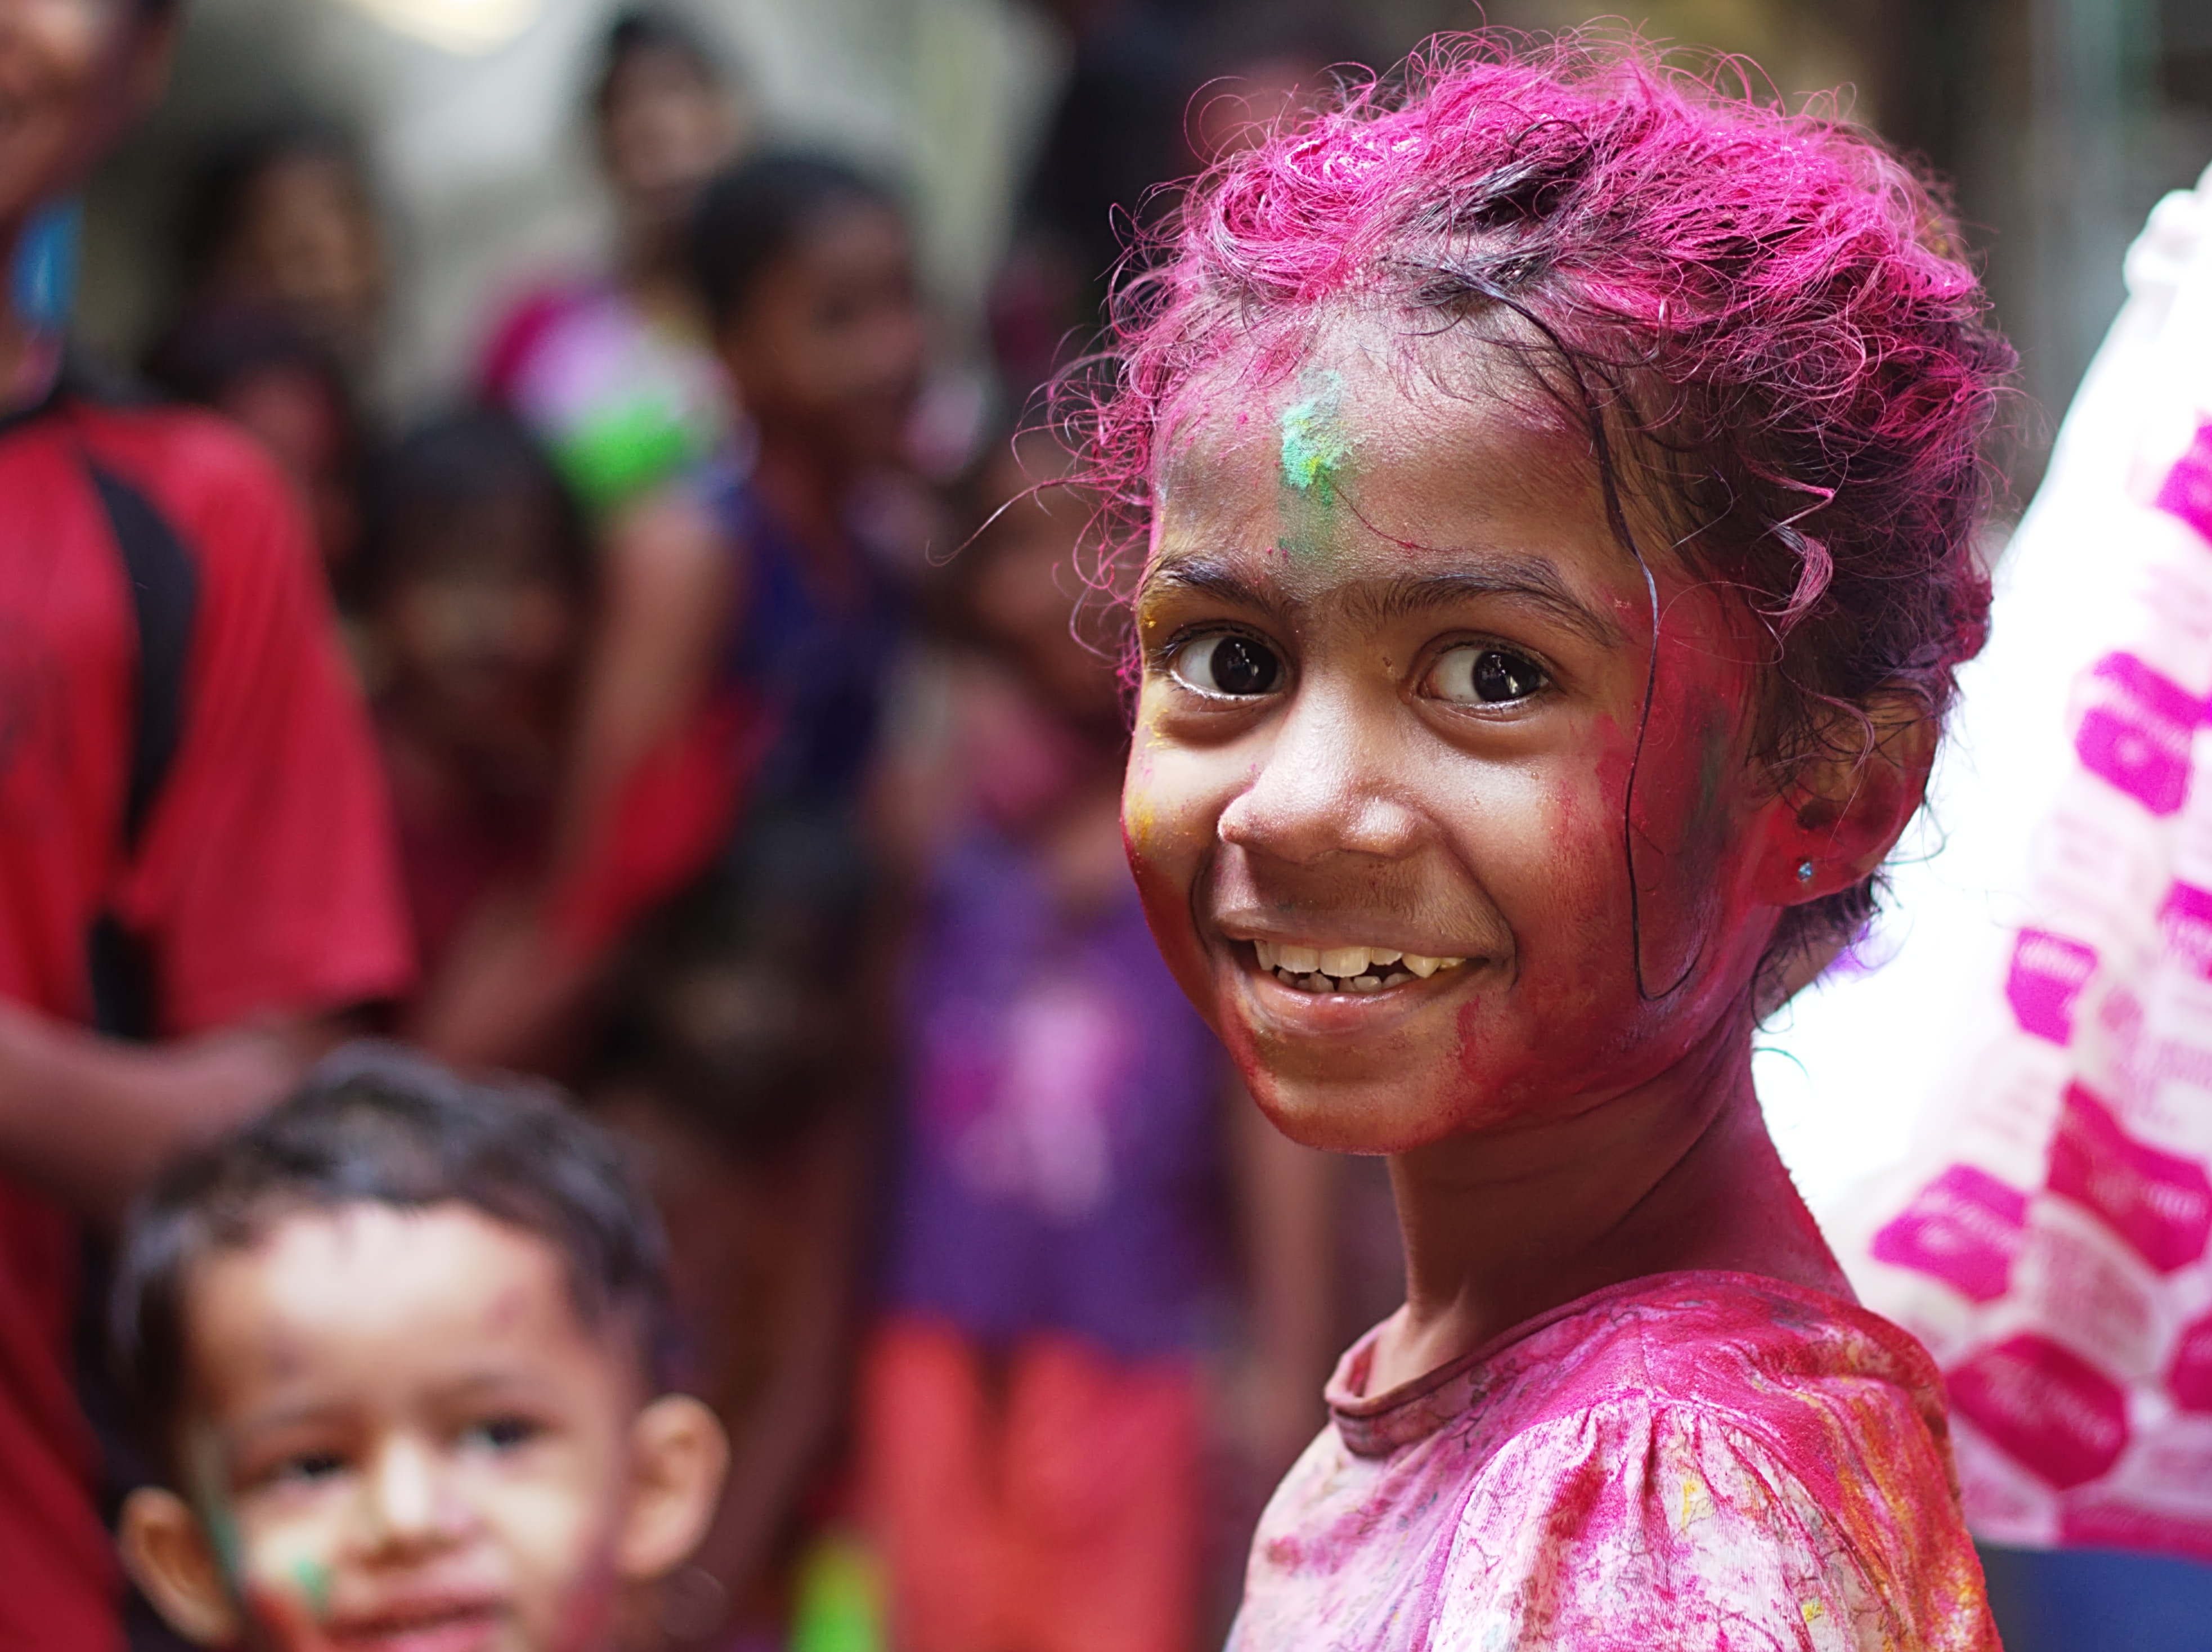 Photo by Himanshu Singh Gurjar on Unsplash